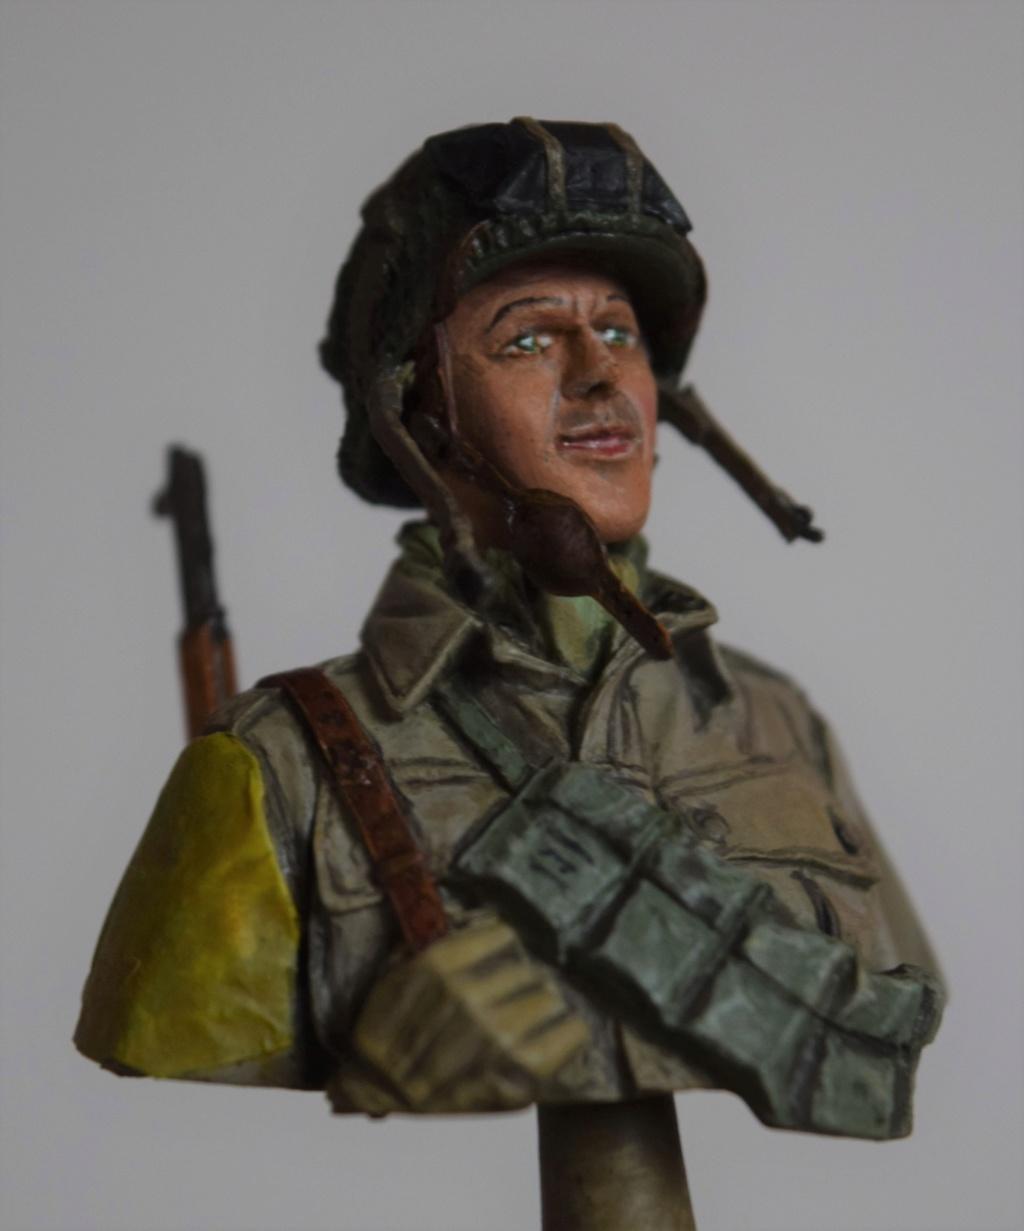 "US Army 82 Airborne """" All american "" - buste  1/16 de chez ALPINE FIGURINES .[ Terminé ] Dsc_0214"